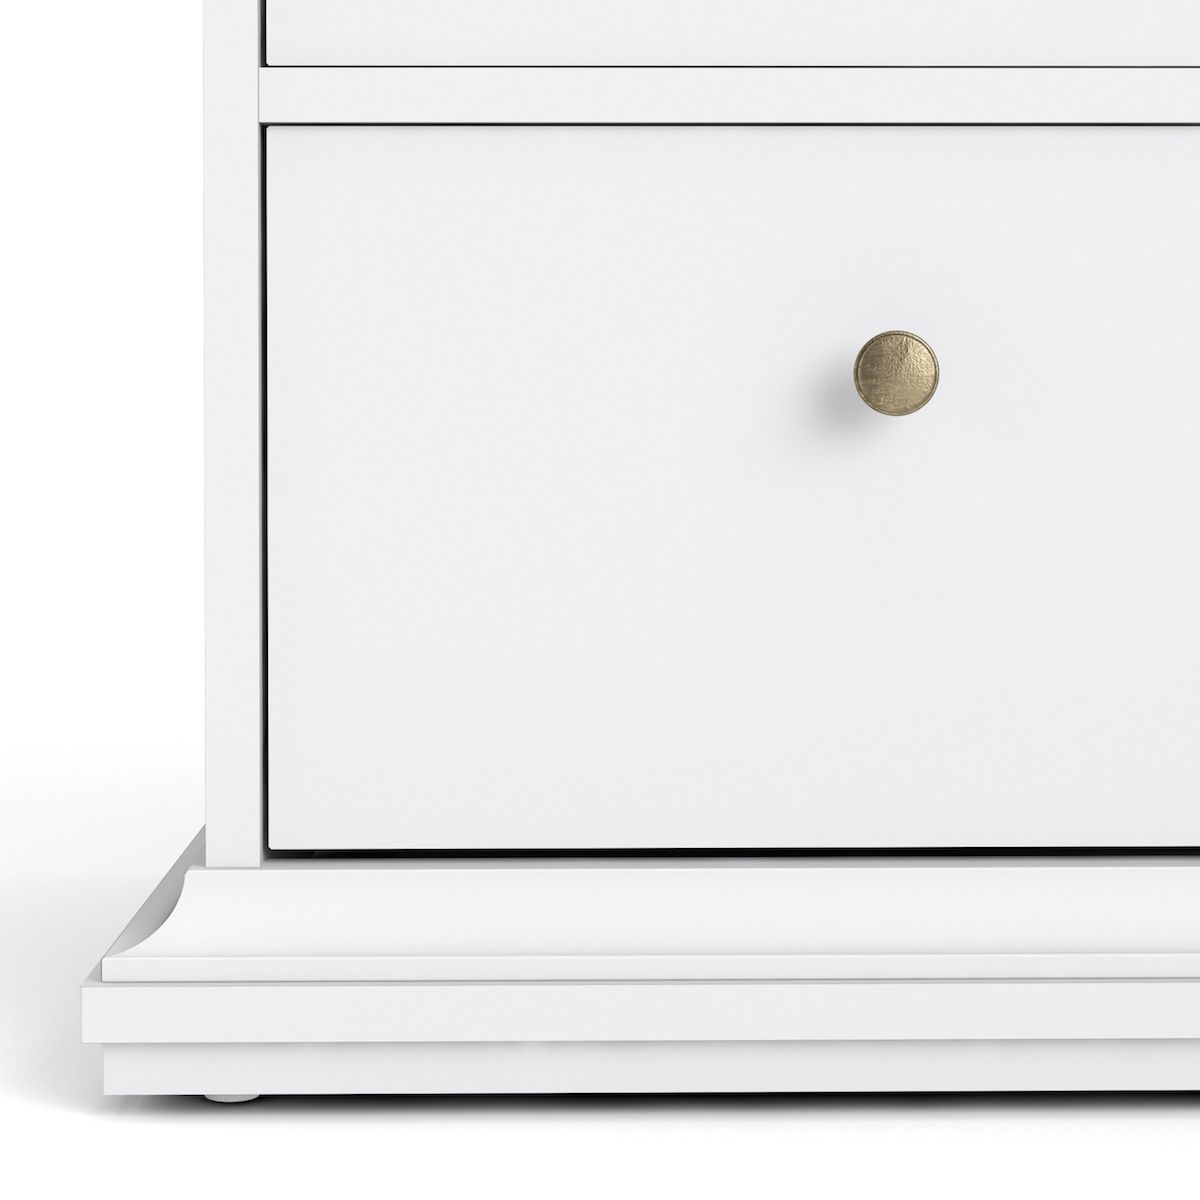 Paris Kommode - Hvid m/6 skuffer - Kommode med 6 skuffer i hvid